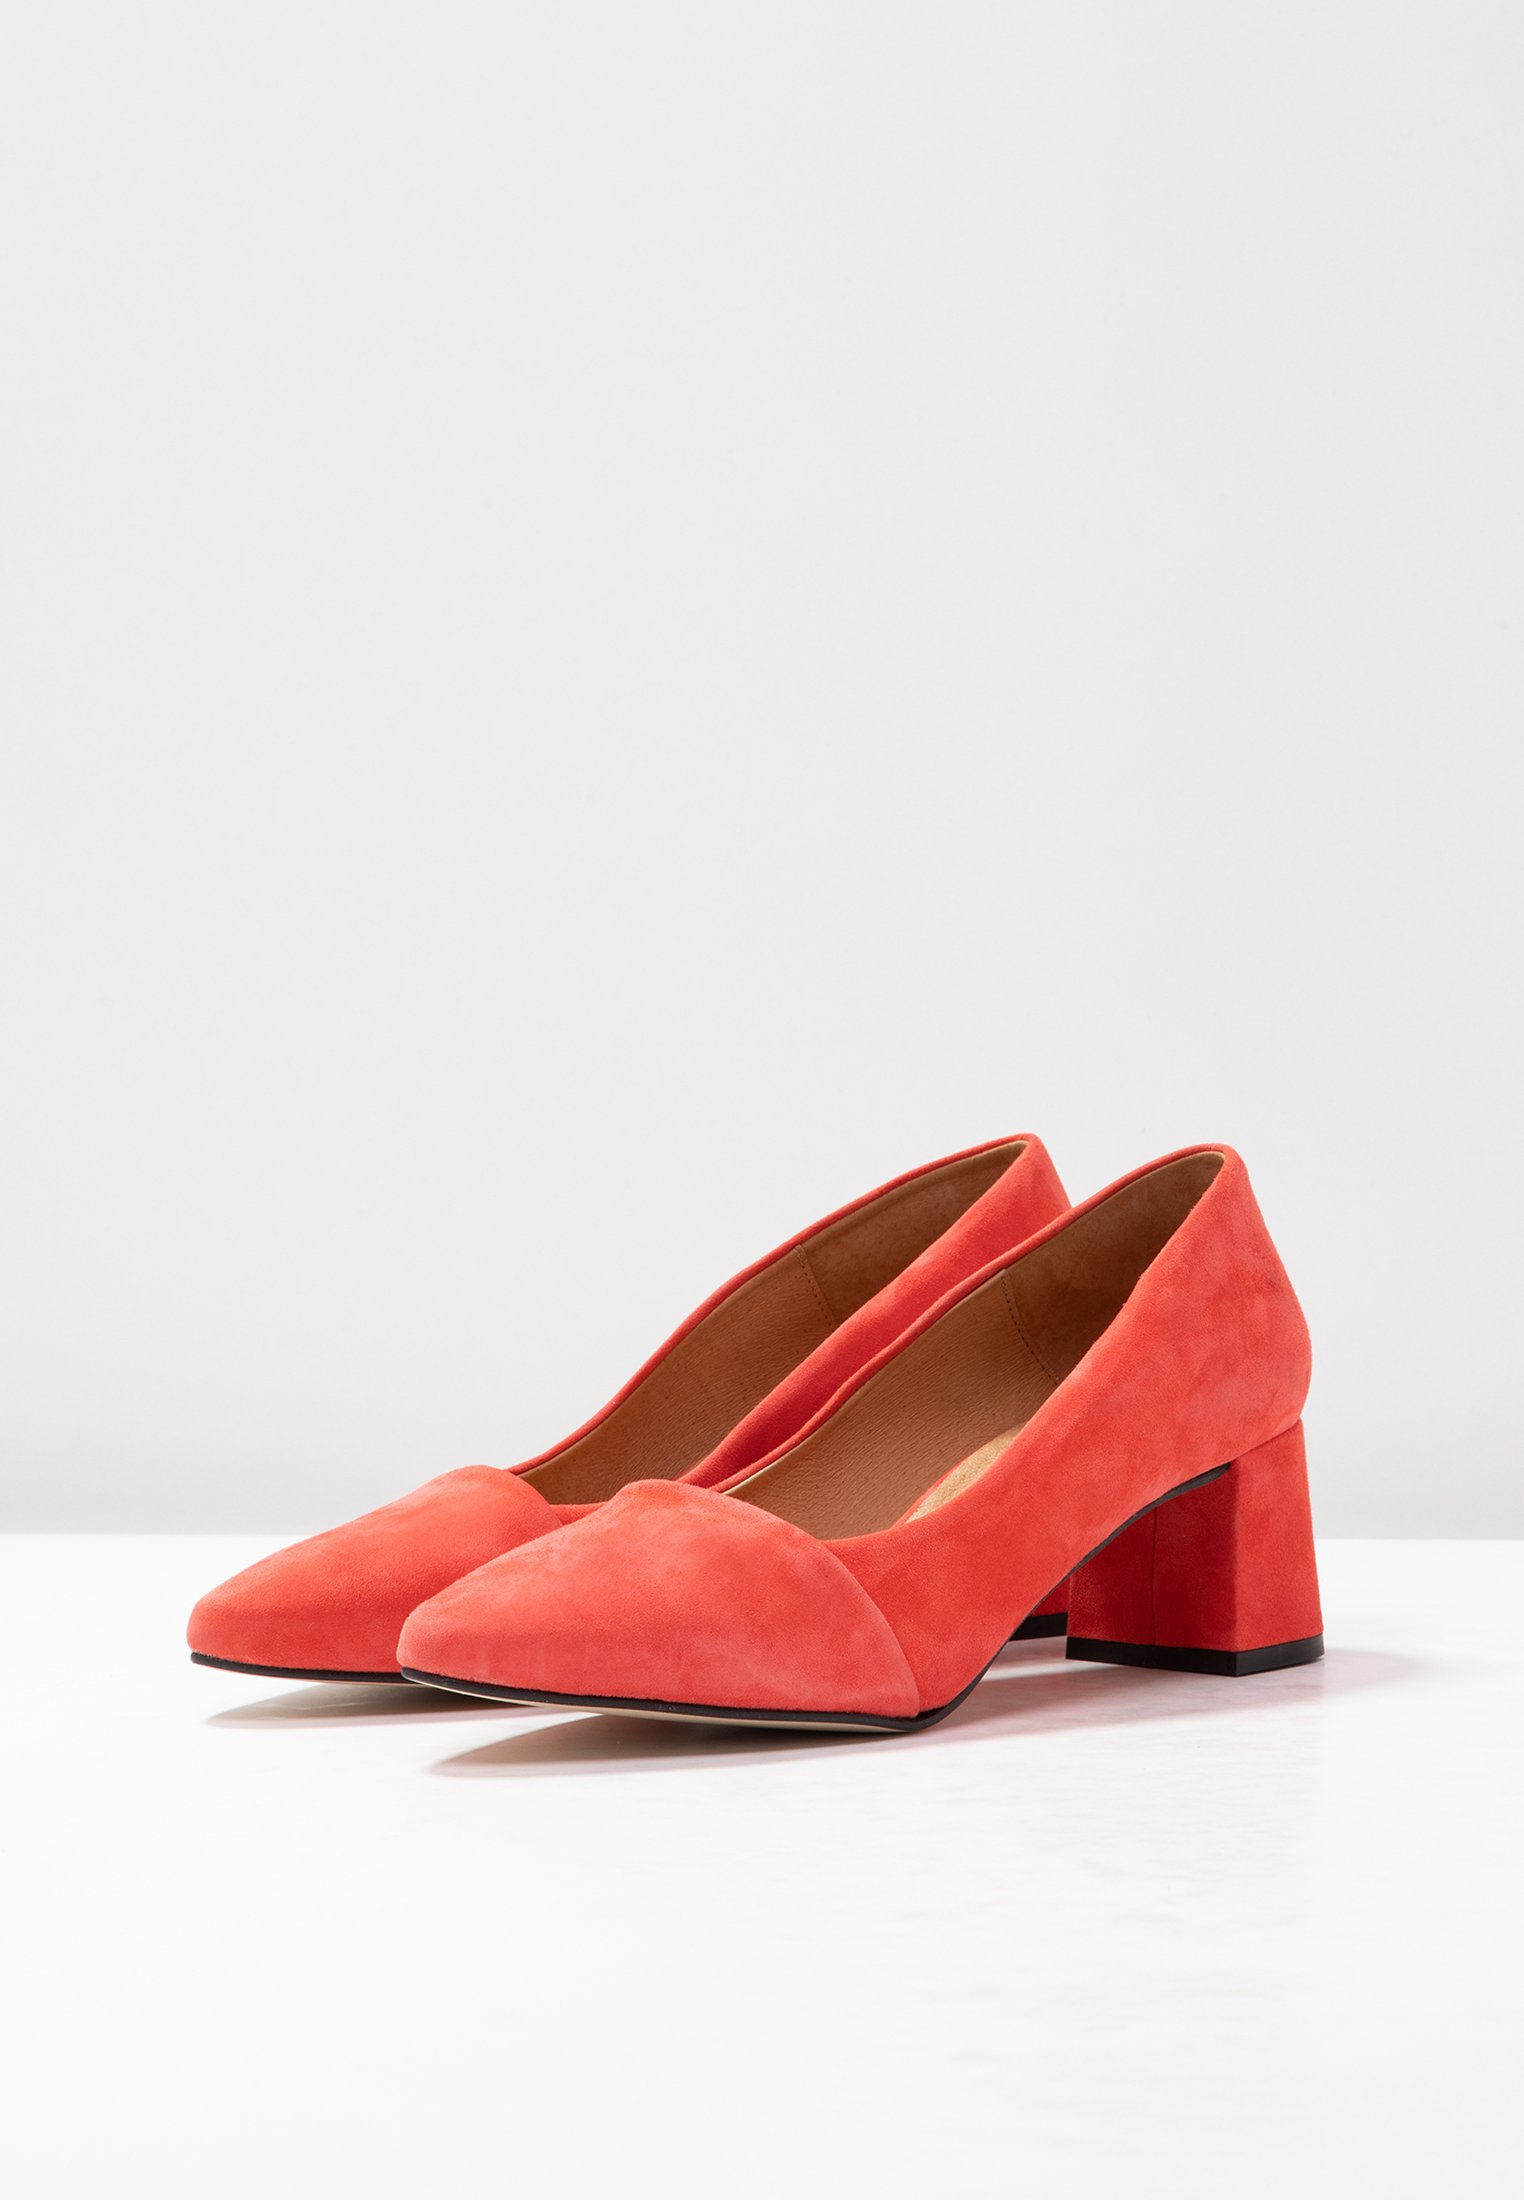 The AllisonEscarpins Bear Shoe Coral Red xrdBoCe